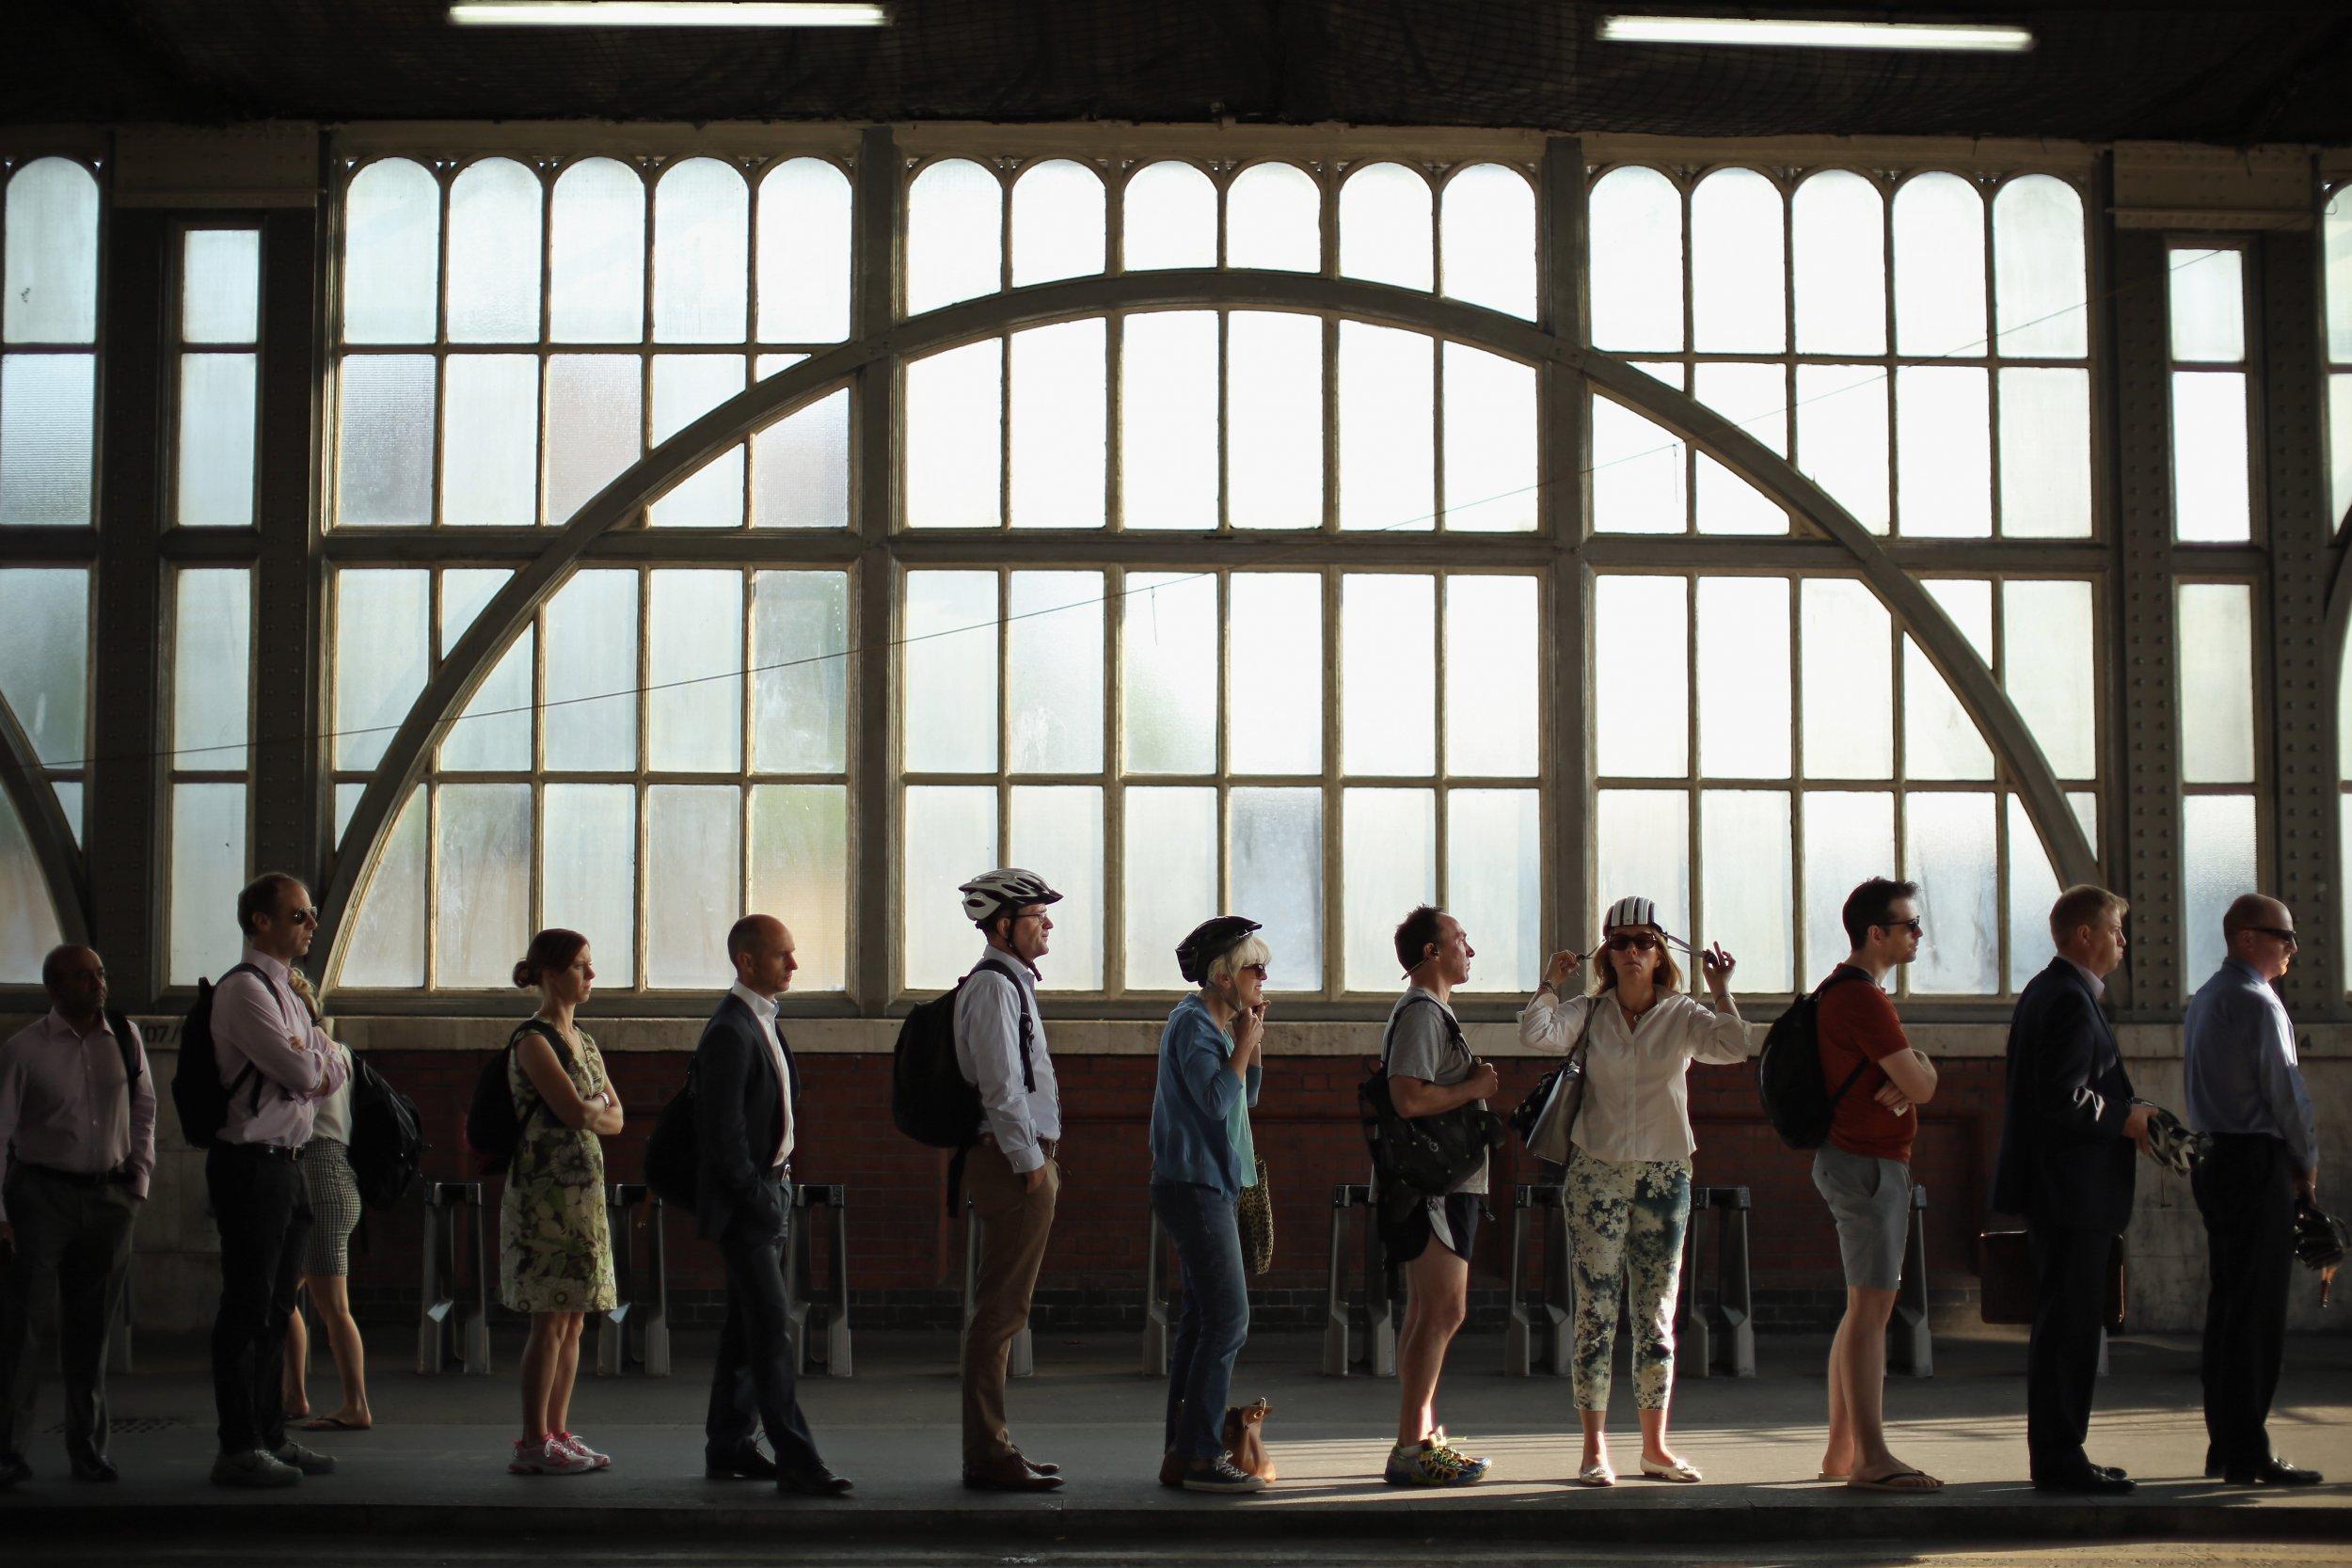 Commuters line London